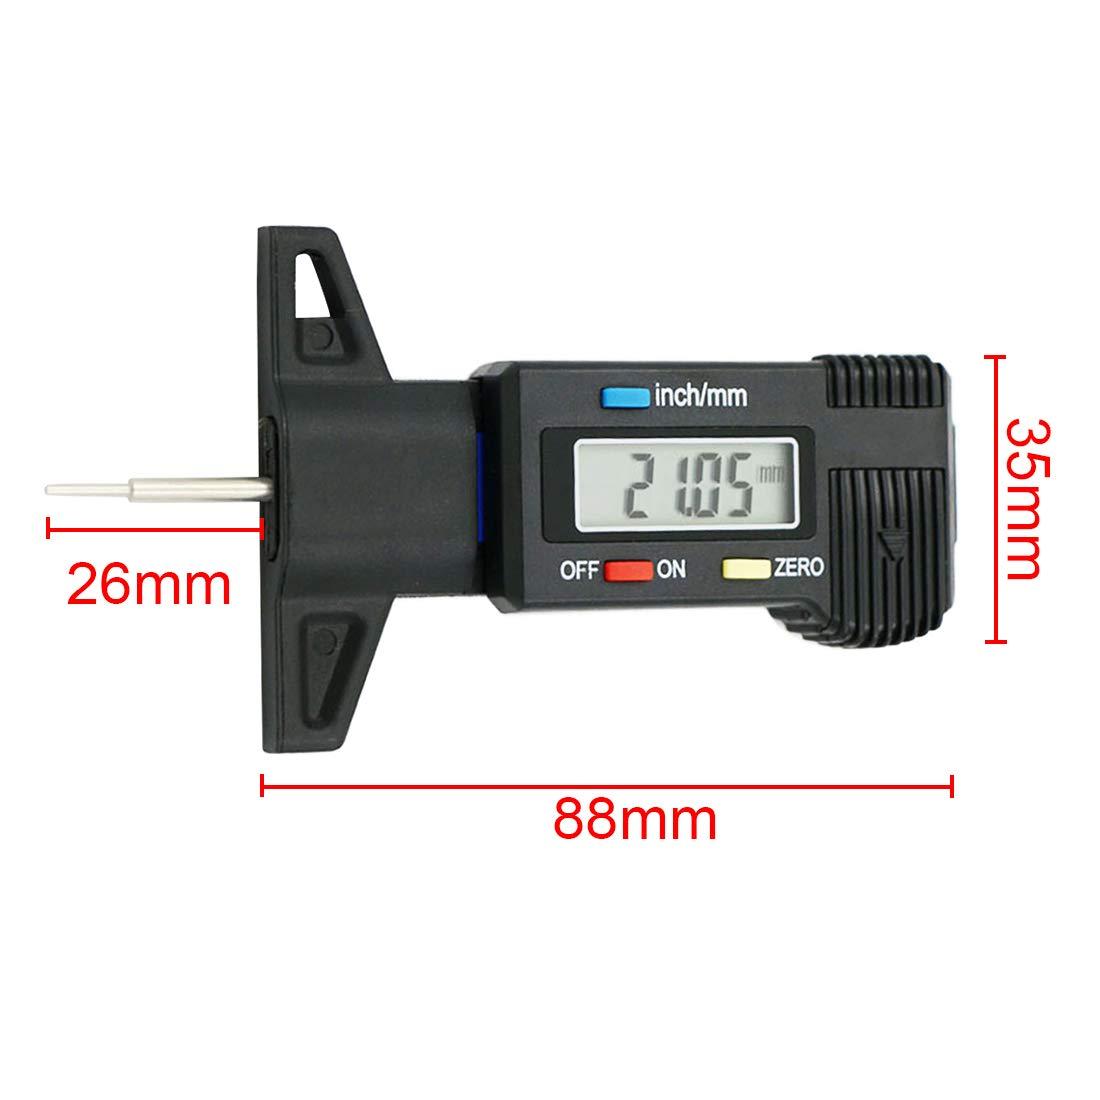 Digital Depth Gauge 0-25.4mm LCD Caliper Tread Depth Gauge for Car Tire Measurer Tool Caliper